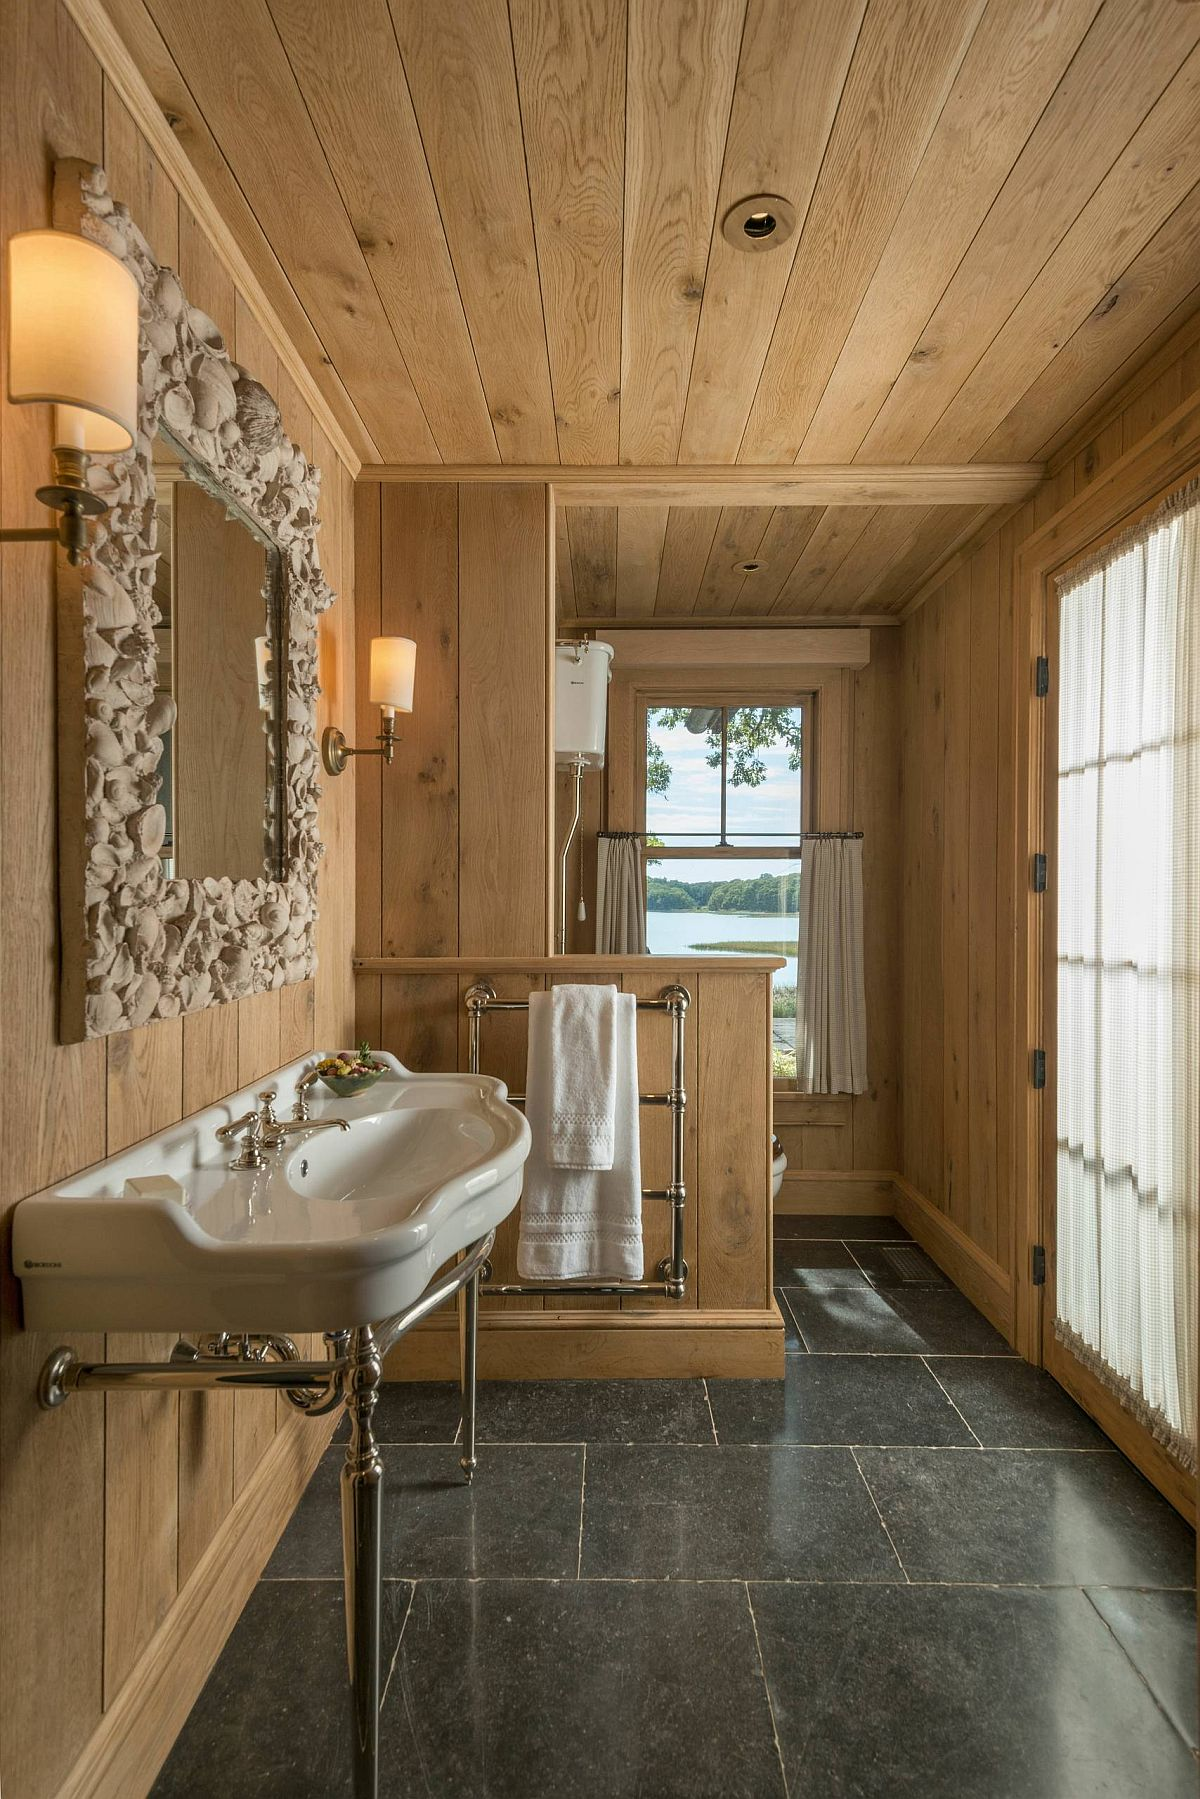 Custom mirror frame for the small rustic bathroom fetauring wood walls and stone flooring